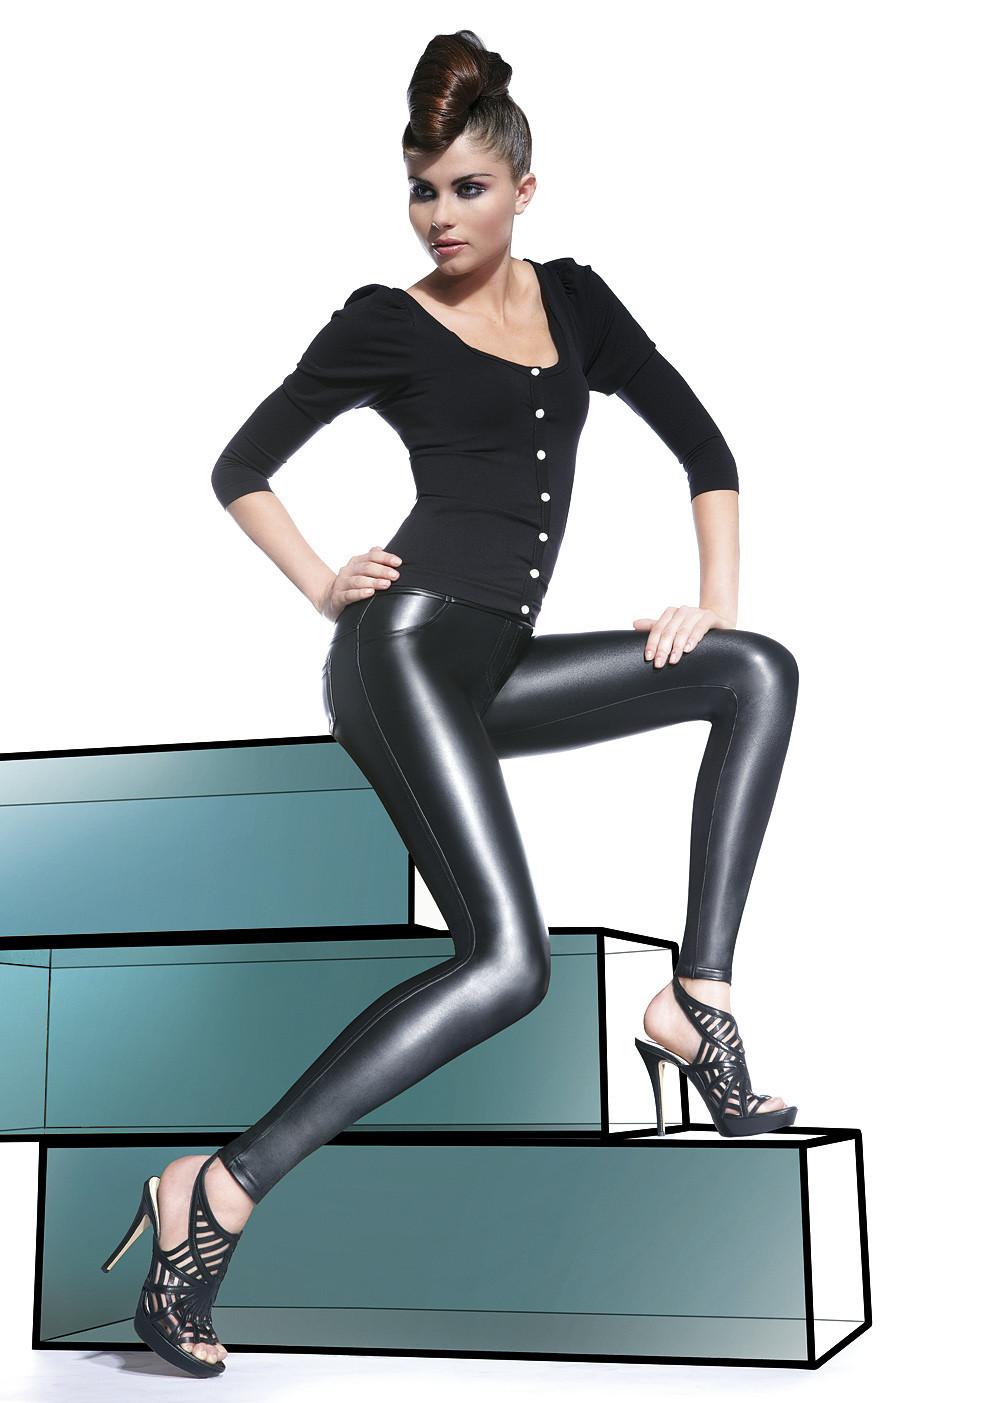 Legíny Vanessa - Bas Bleu barva: černá, velikost: M